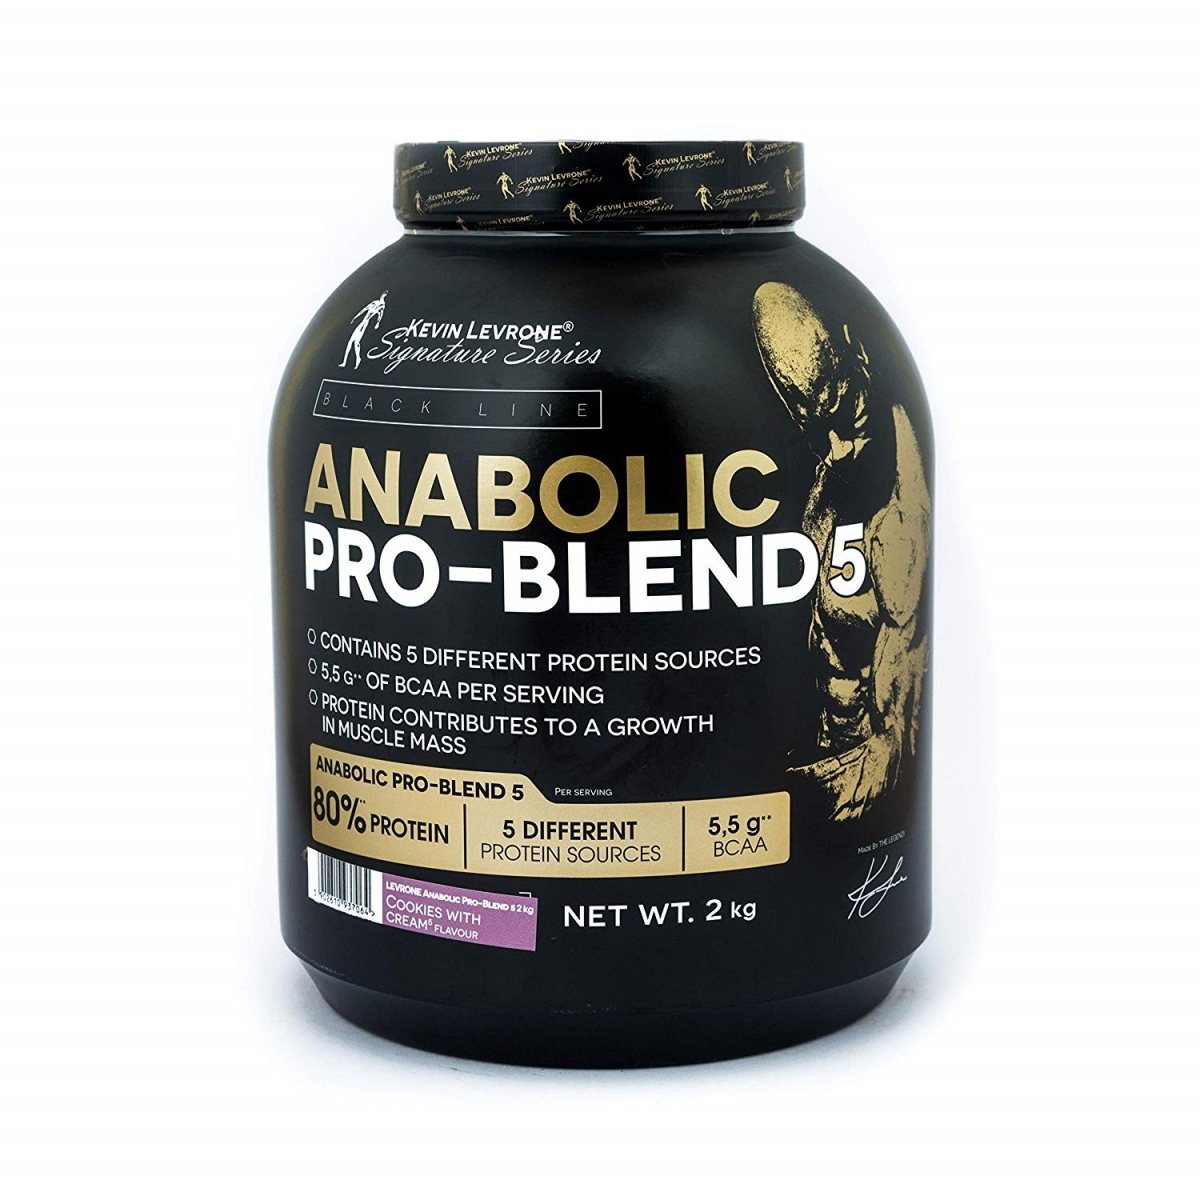 KEVIN LEVRONE Black Line Anabolic Pro Blend 5 2000g